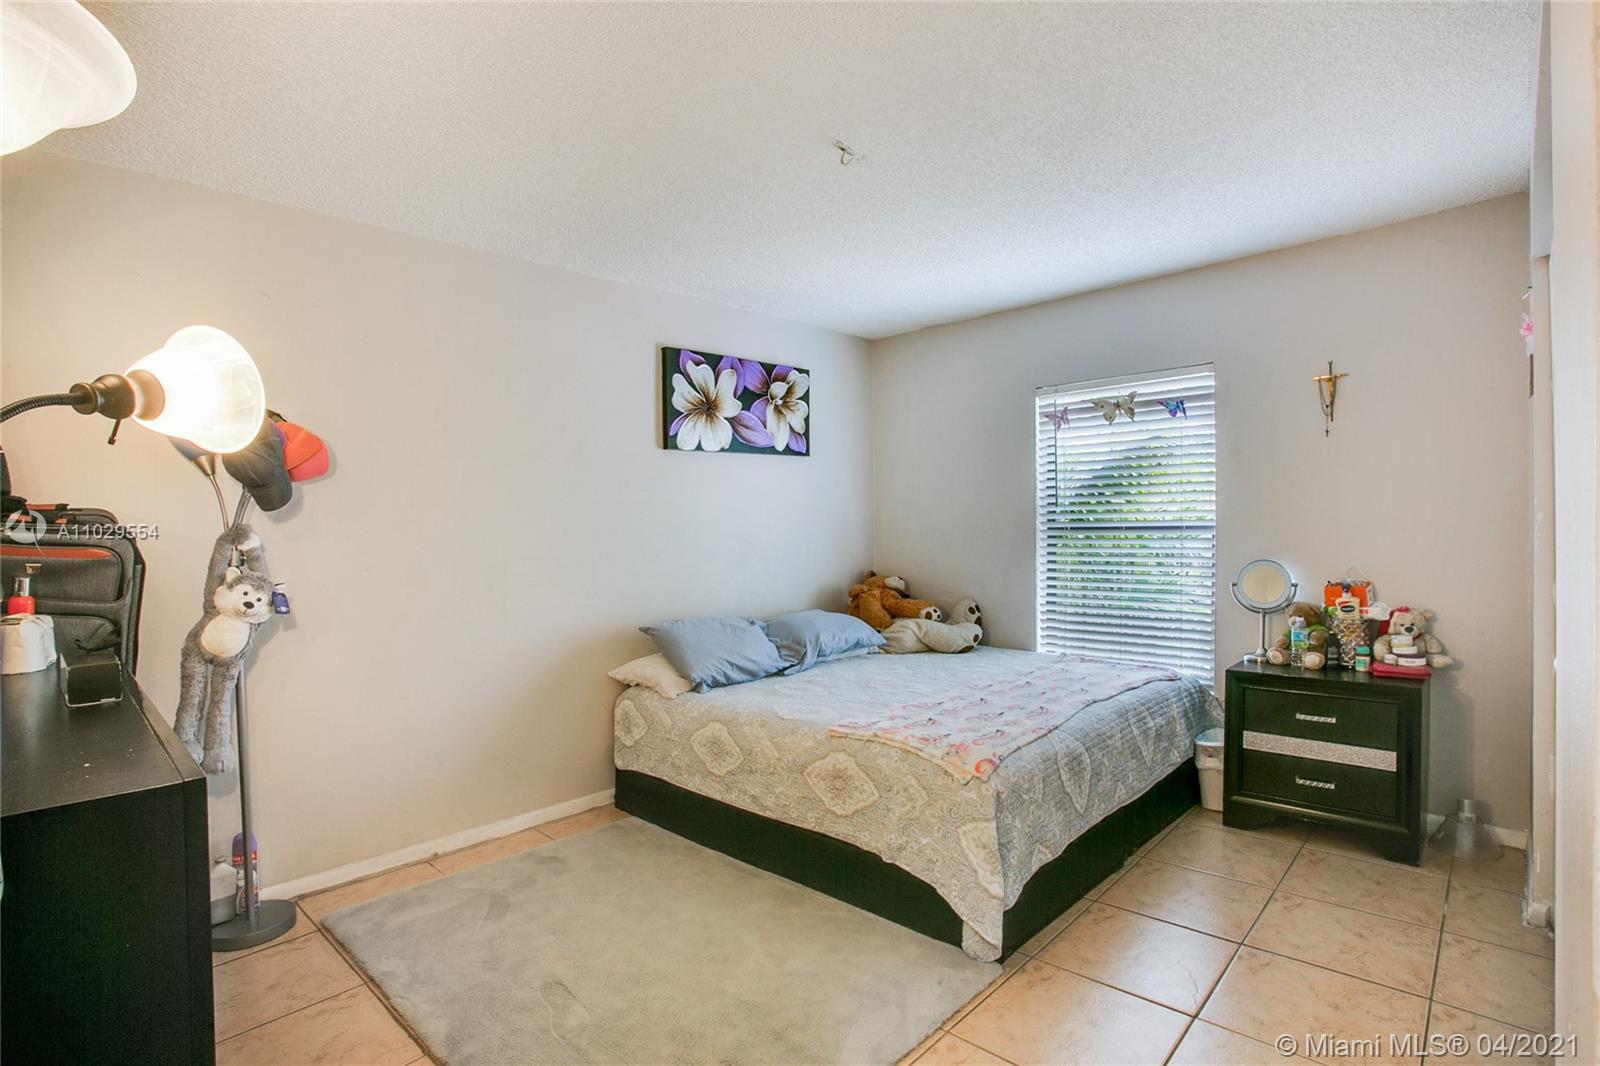 /  4066 sq. ft. $ 2021-04-19 0 Photo